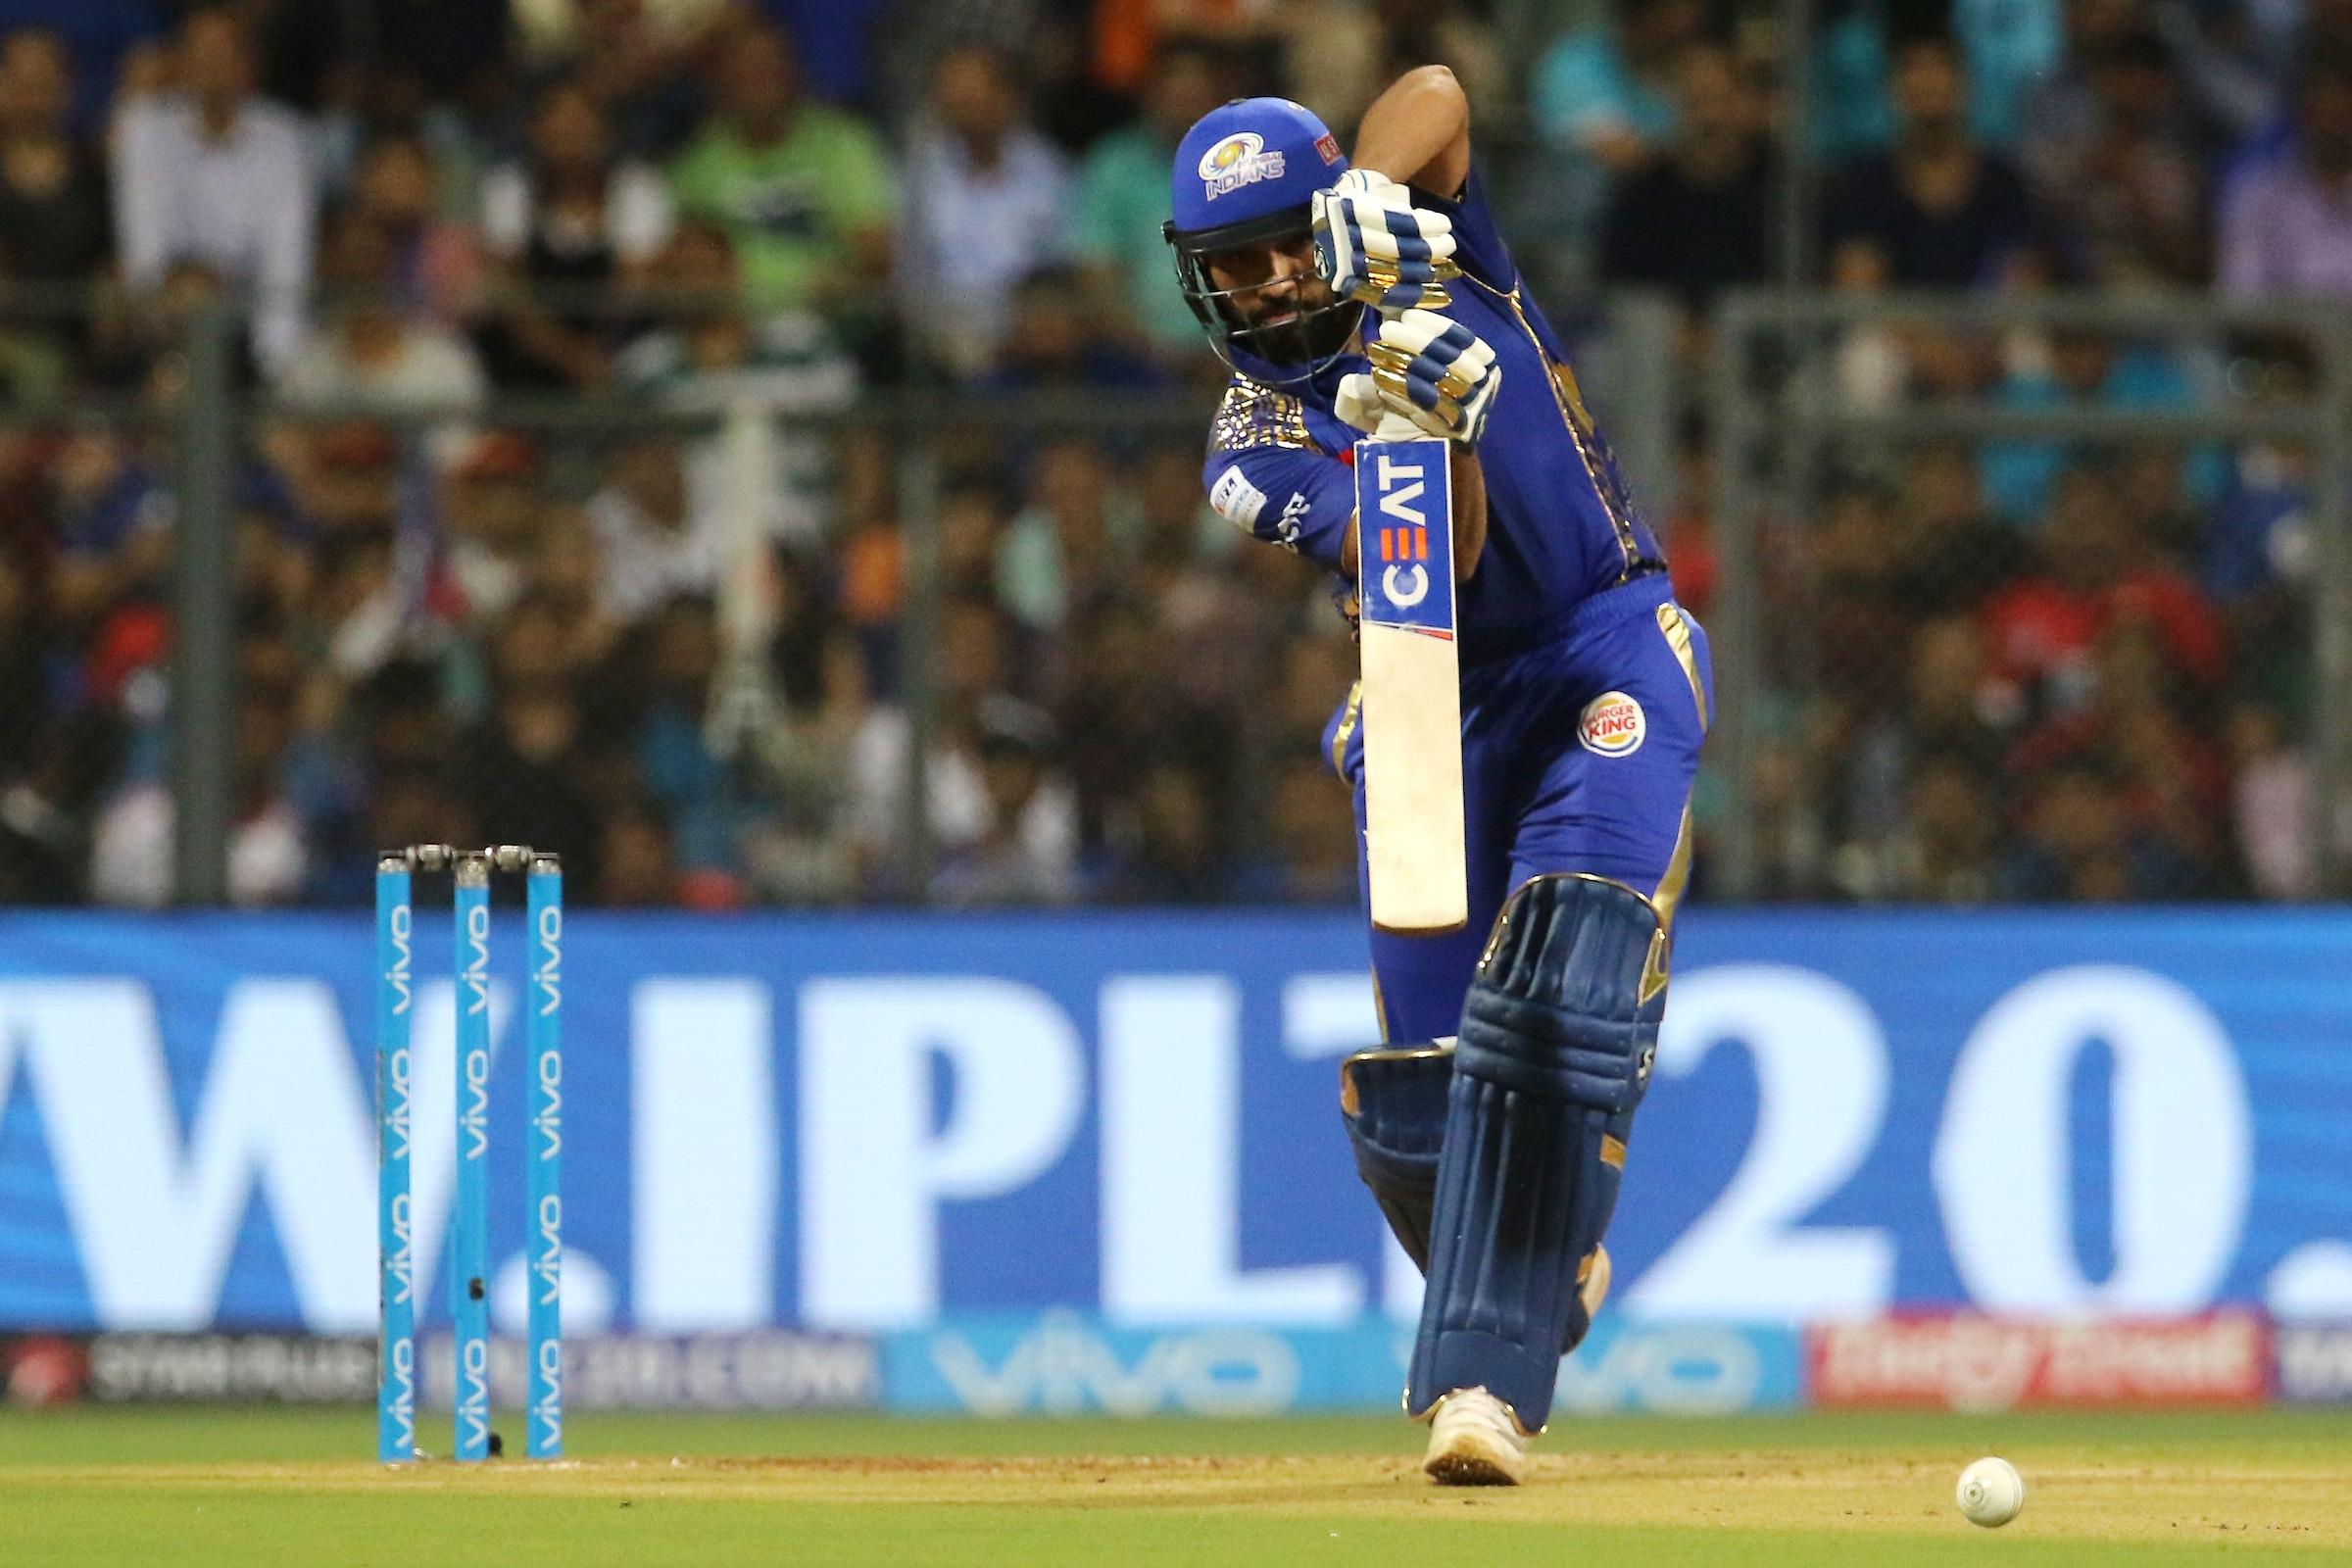 IPL 2018: Rohit Sharma Shines As MI Beat RCB To Earn First Win Of The Season